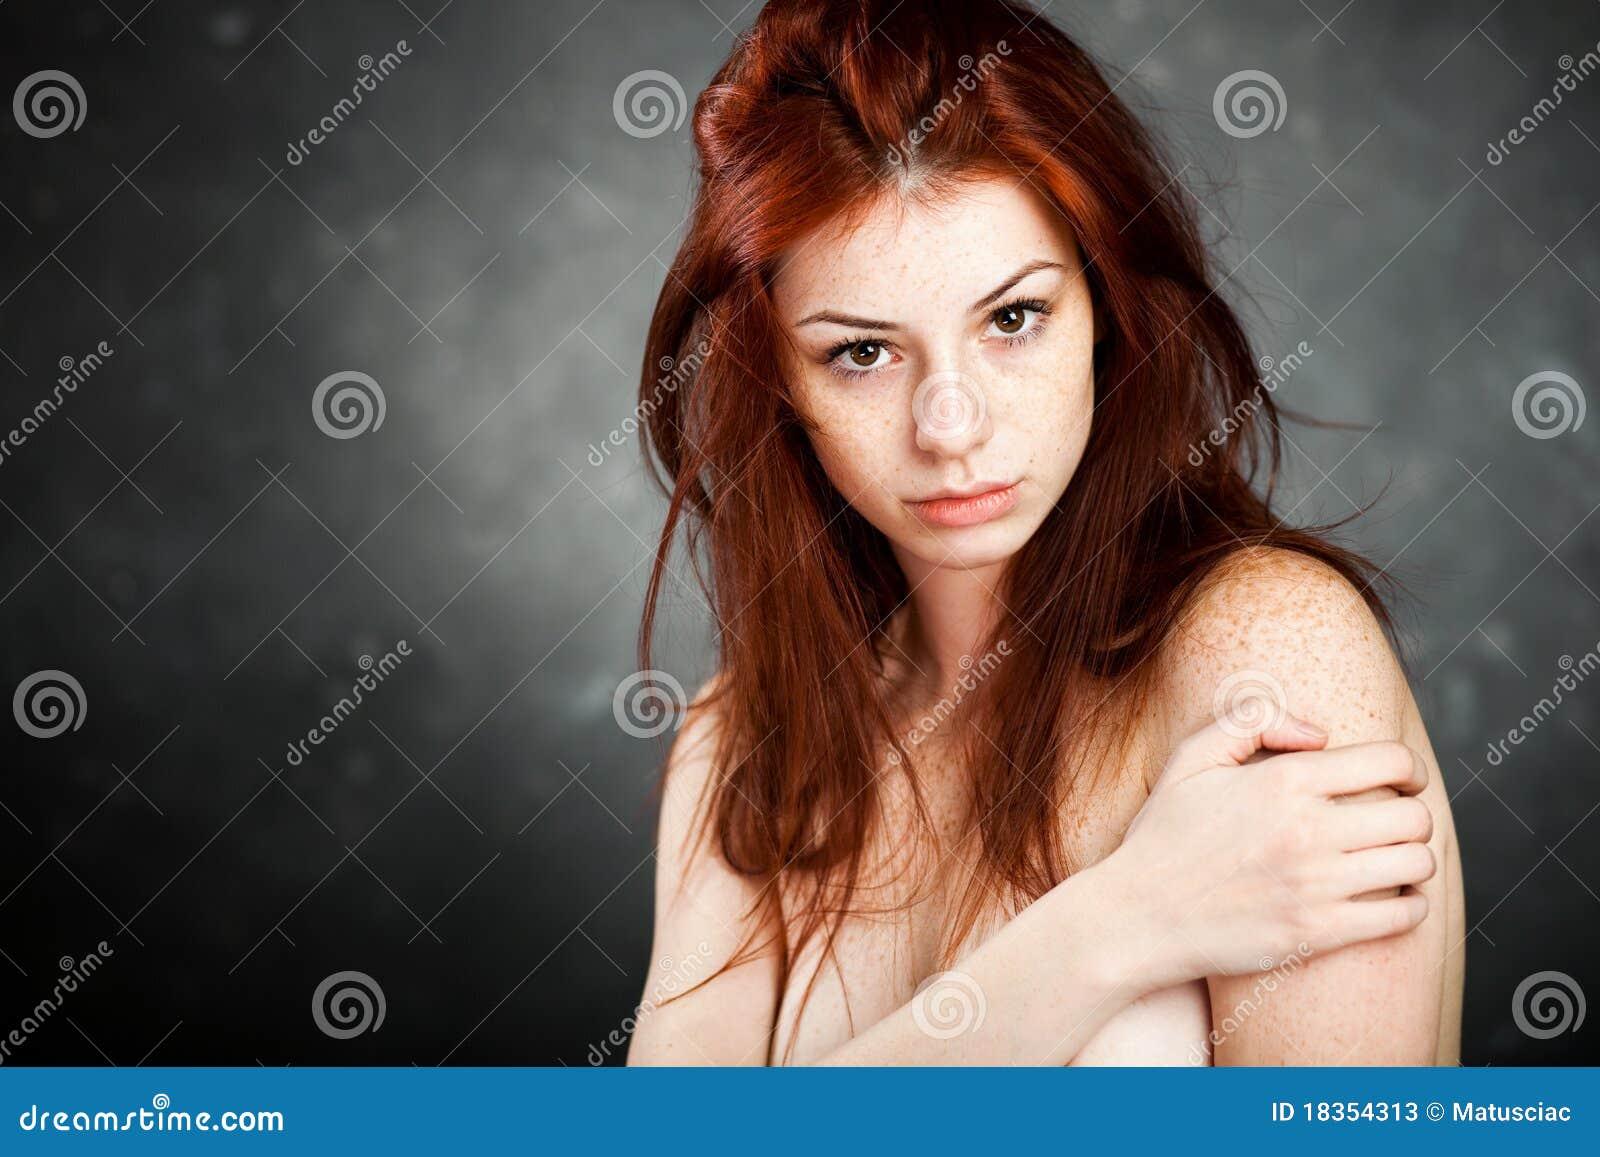 Free black naked porn pussy pics